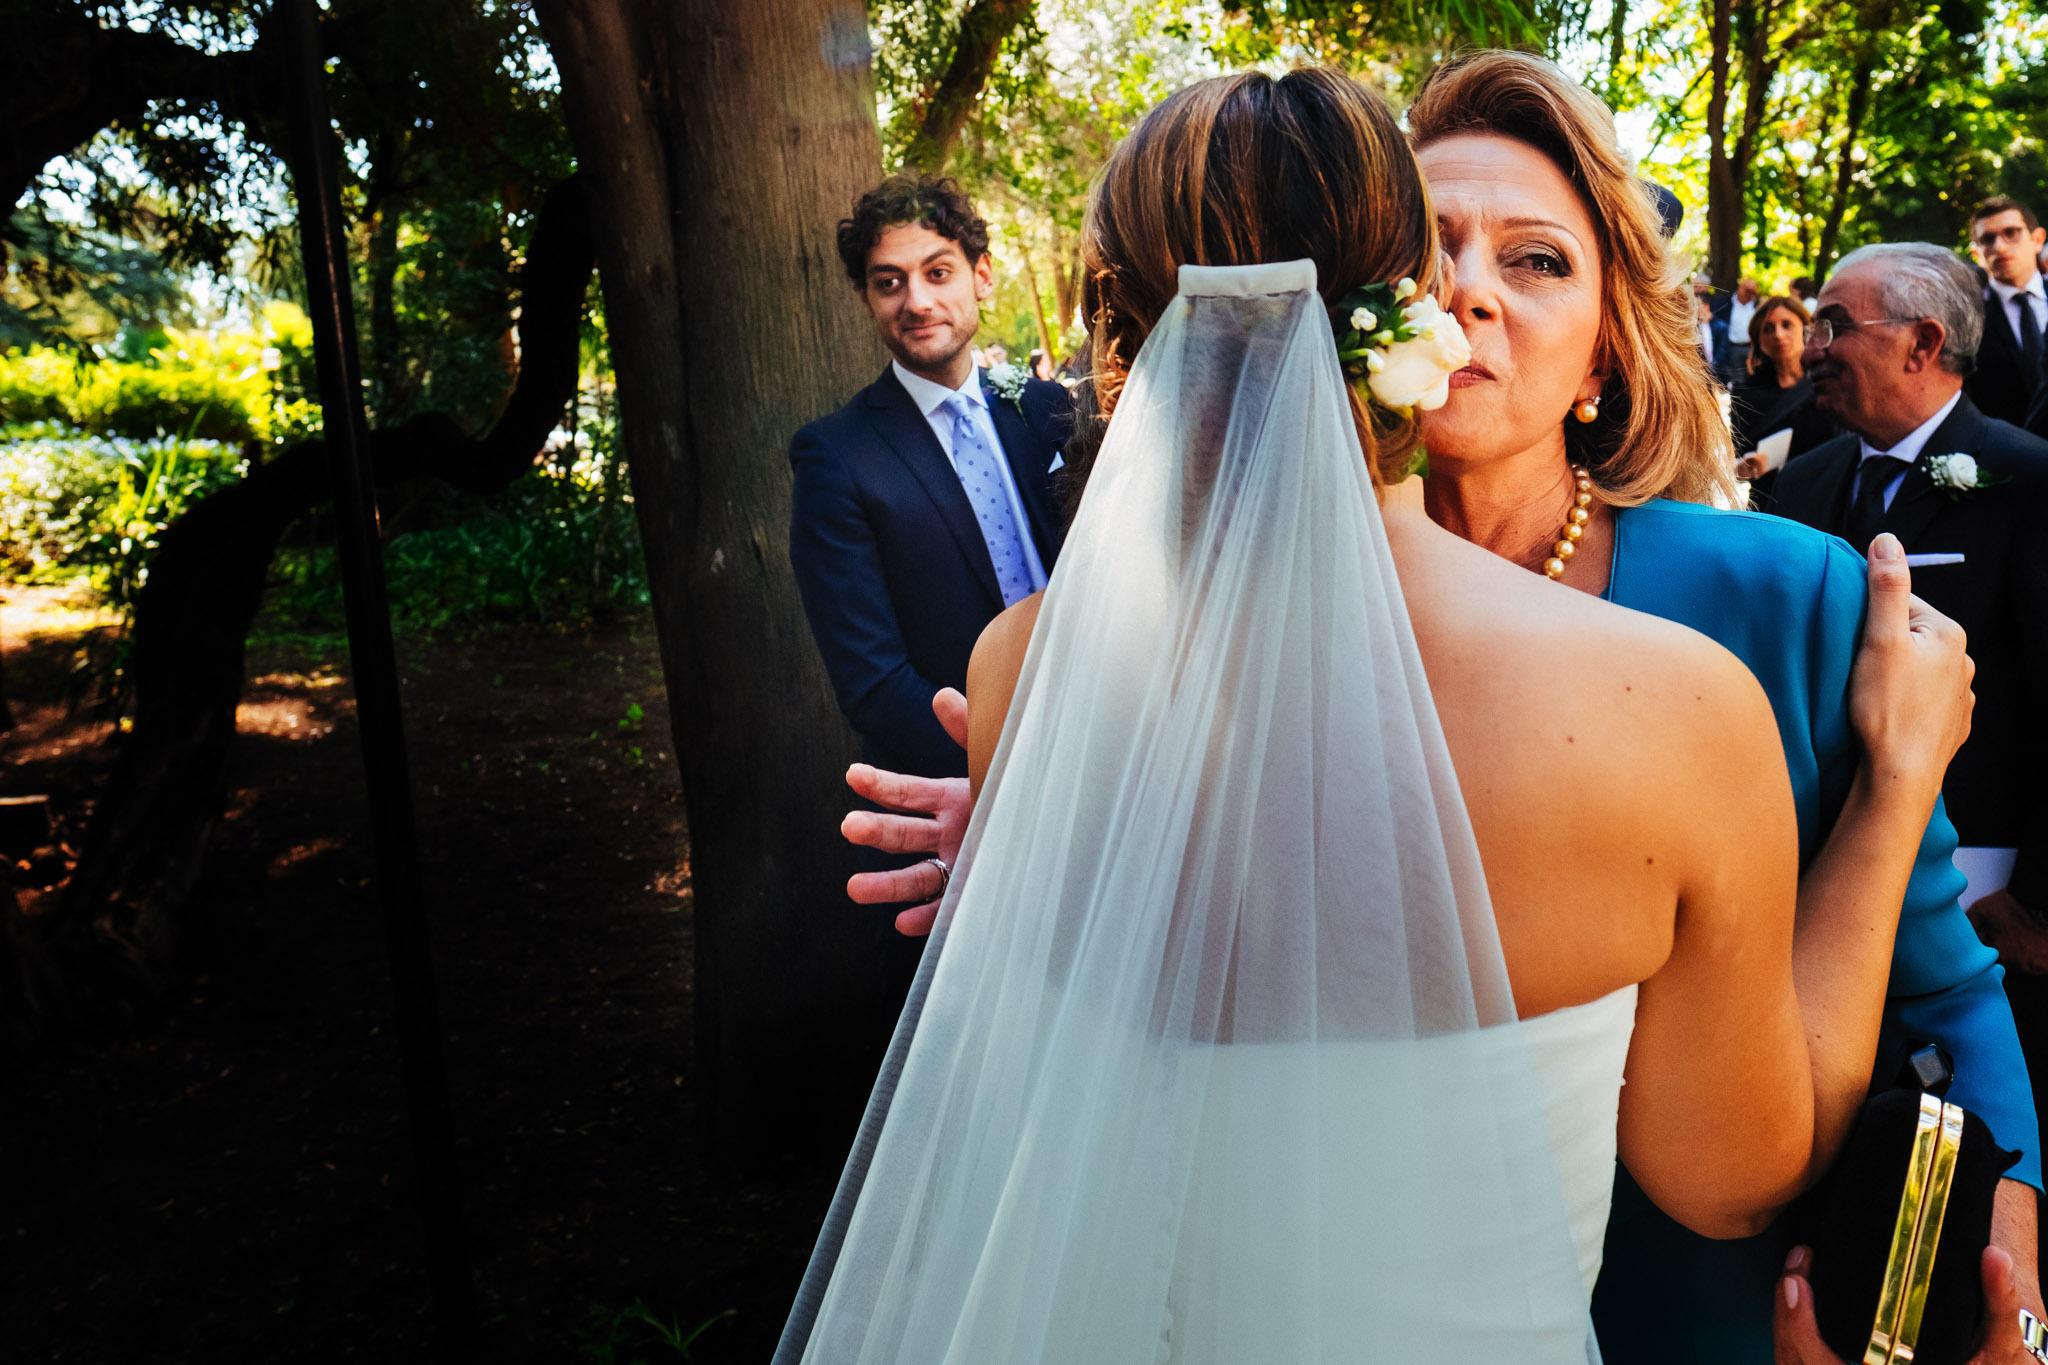 matrimonio-a-catania-40.jpg